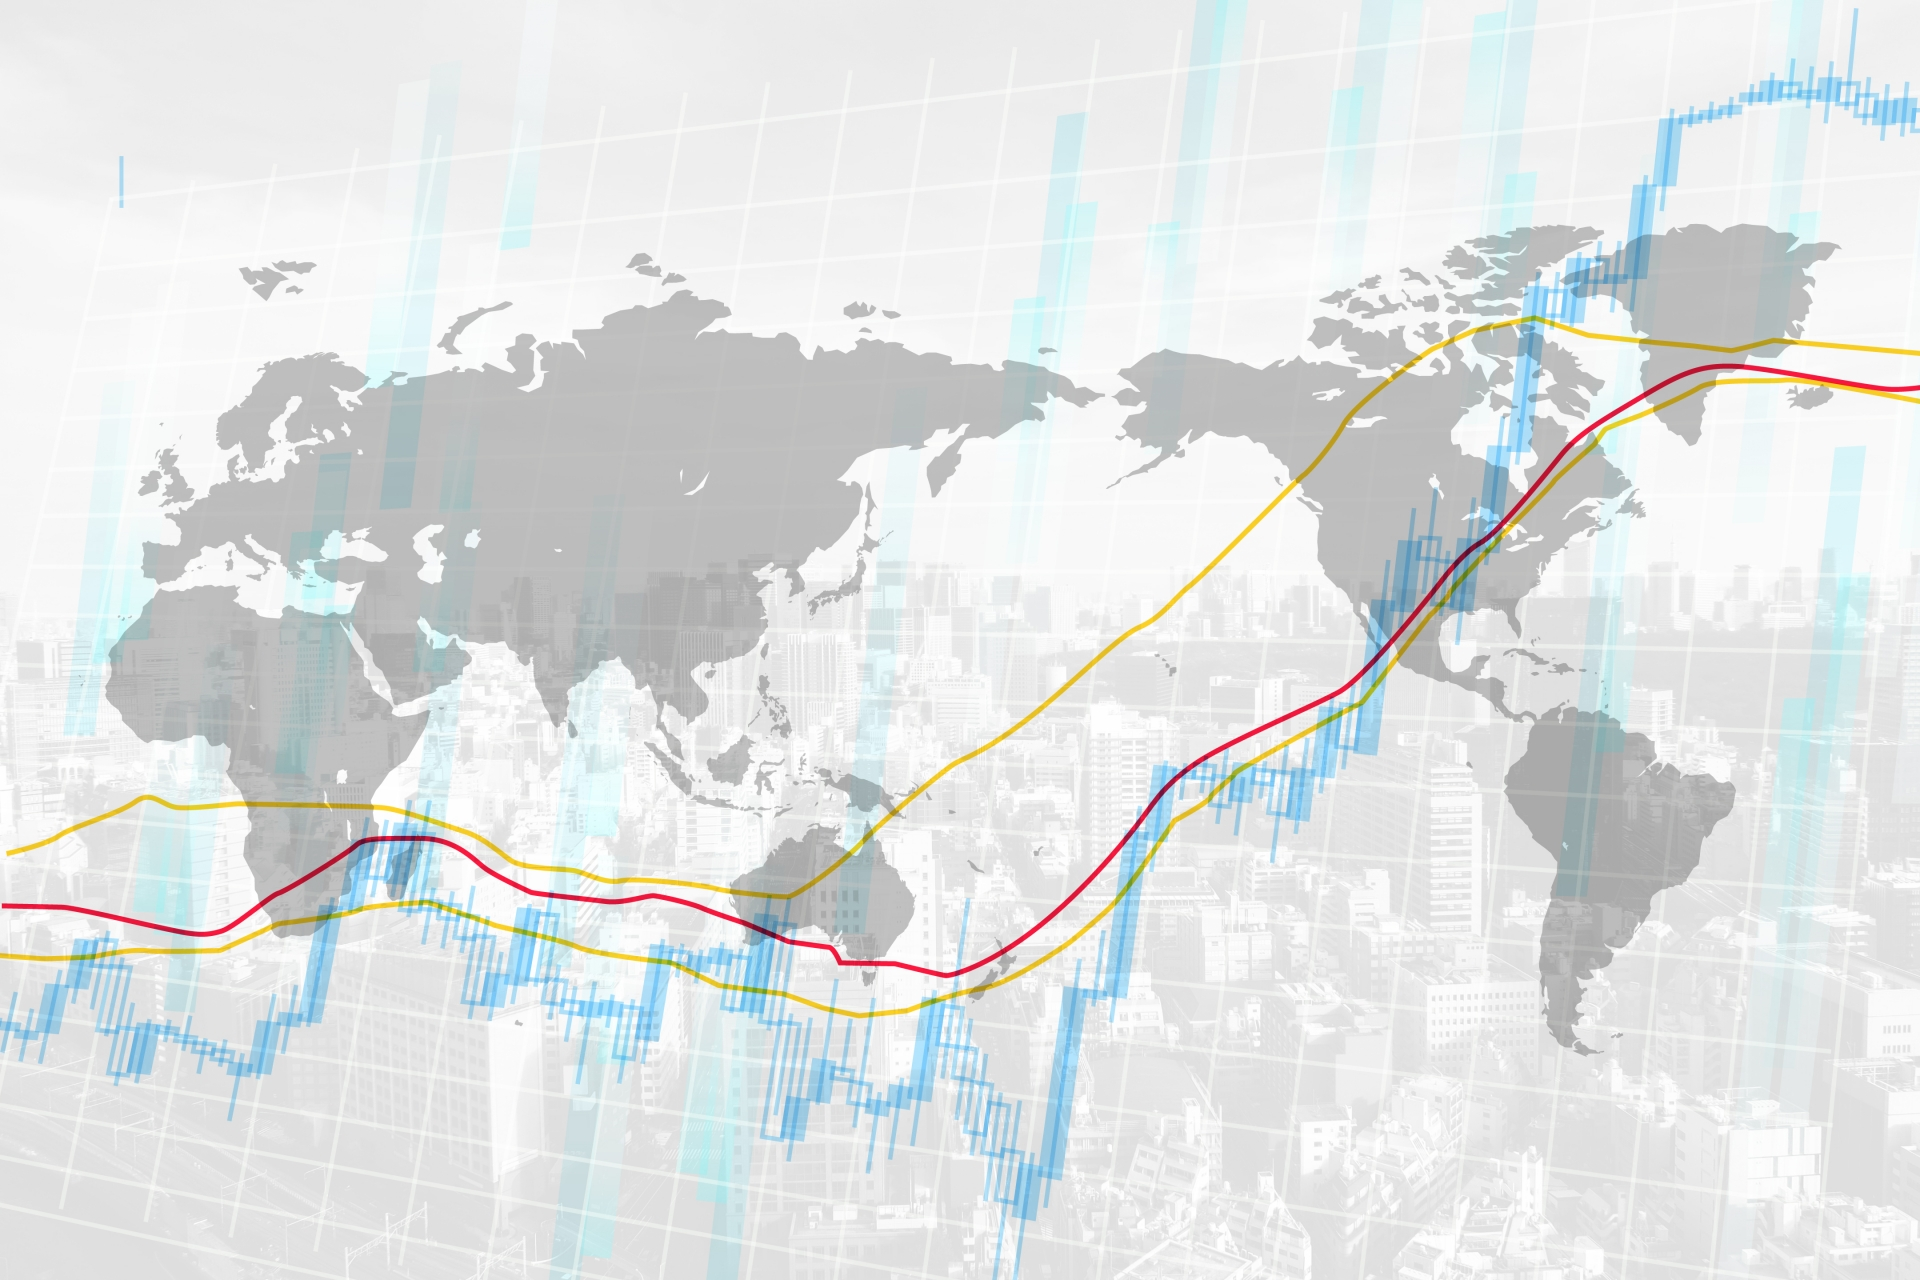 IMFは引き続き資産価格を割高と評価